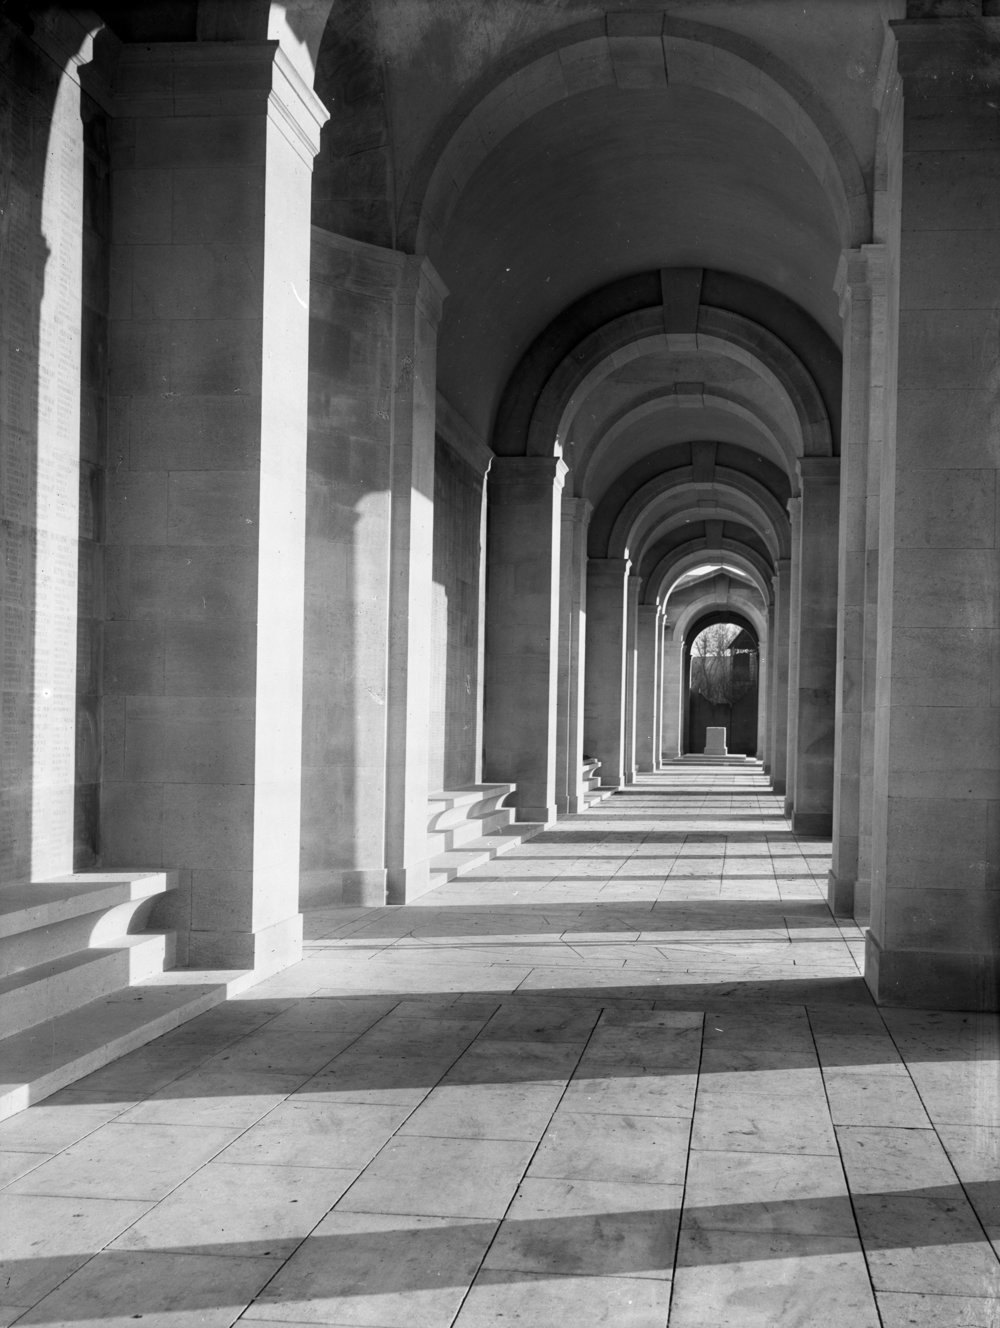 00636_001 - Arras Memorial Fauborg D'Amiens Cemetery France.jpg